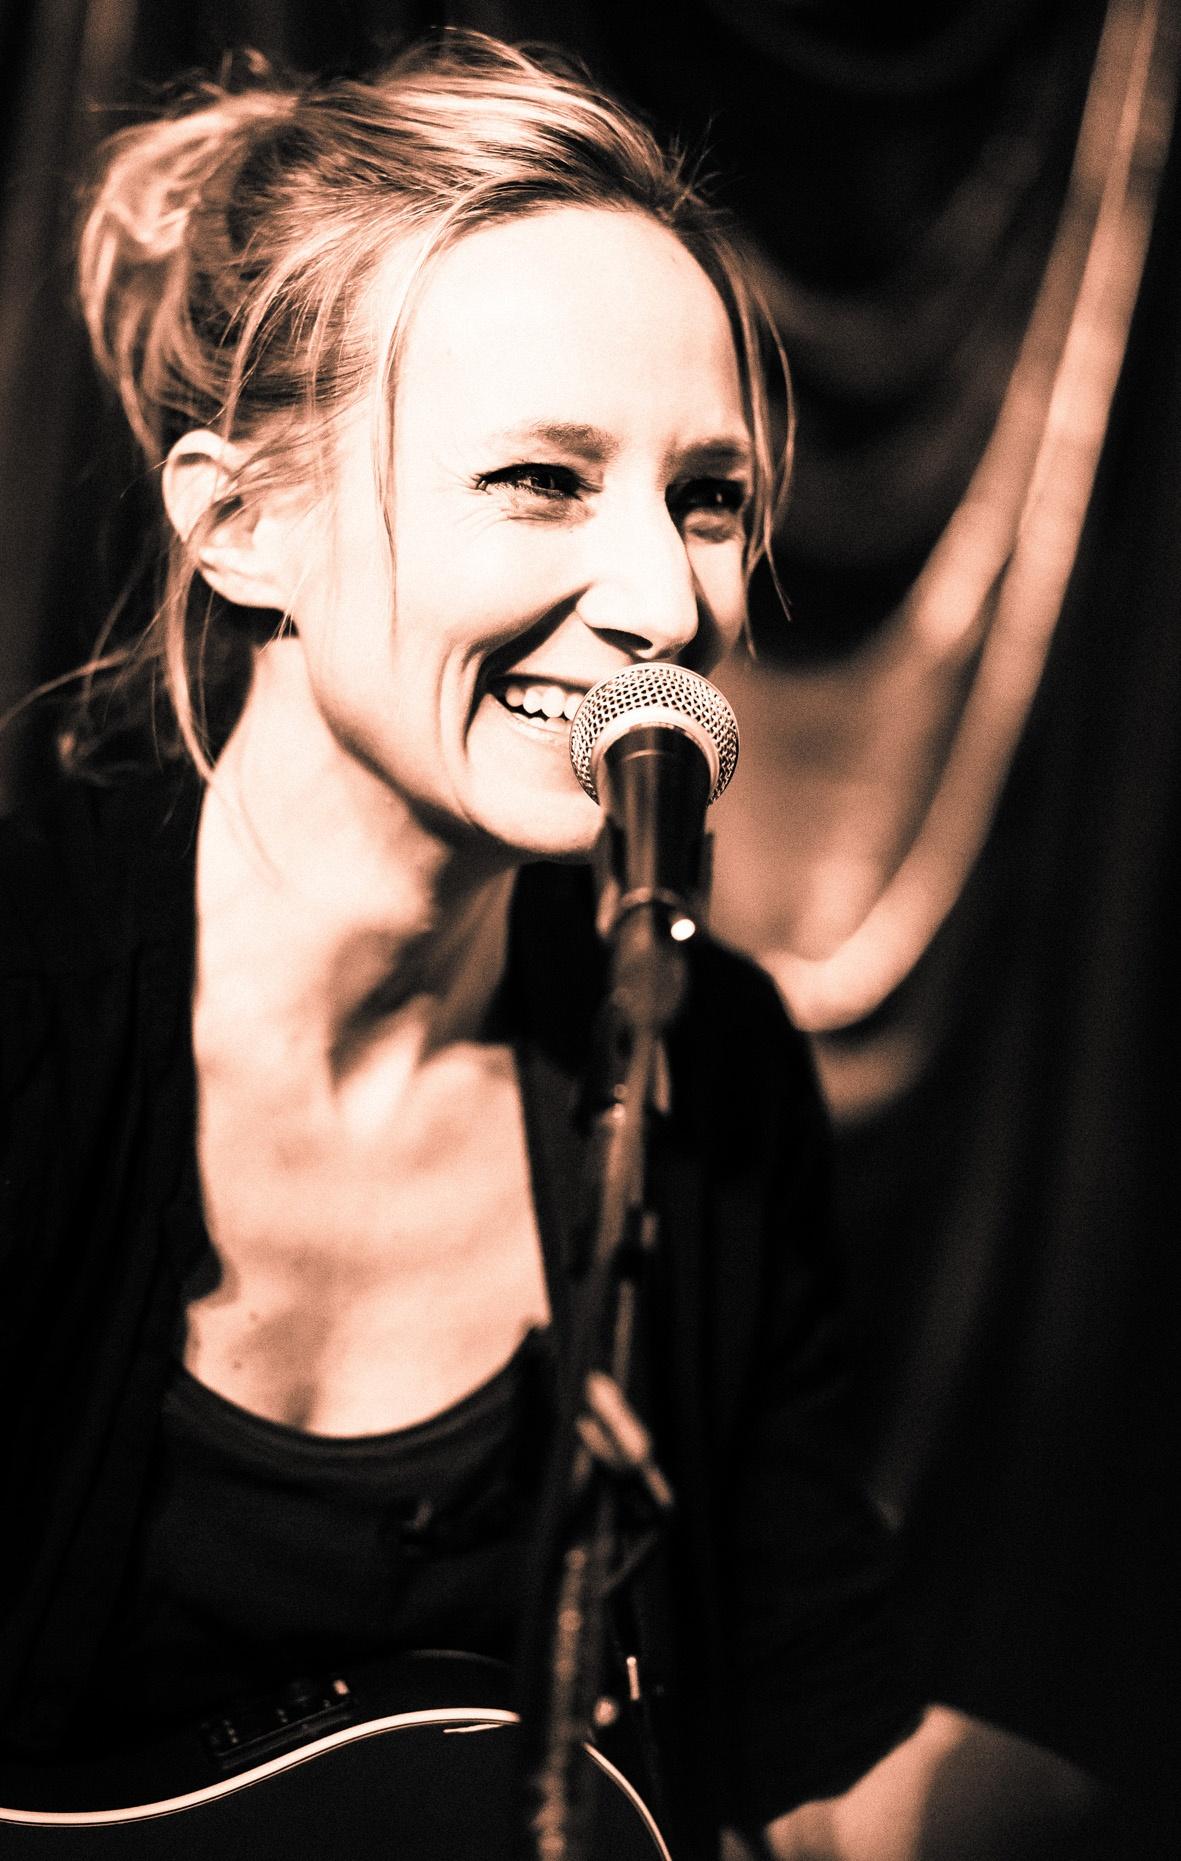 Susanna-Vocals_Foto_Frederik_Görges